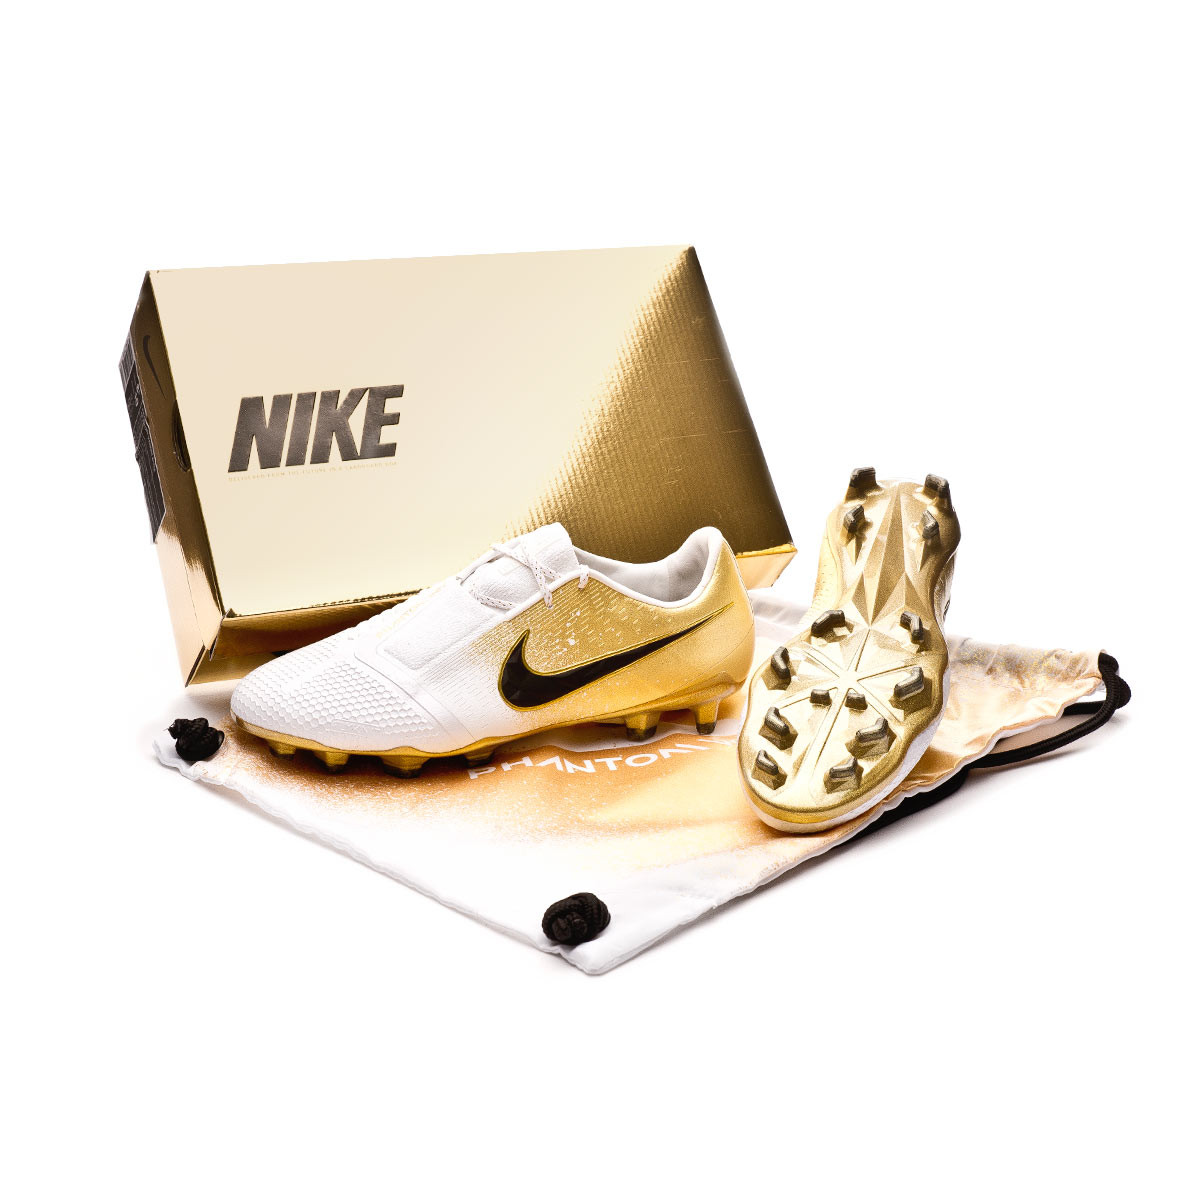 3416886d3 Nike Phantom Venom Elite FG Euphoria Mode Football Boots. Champagne gold ...